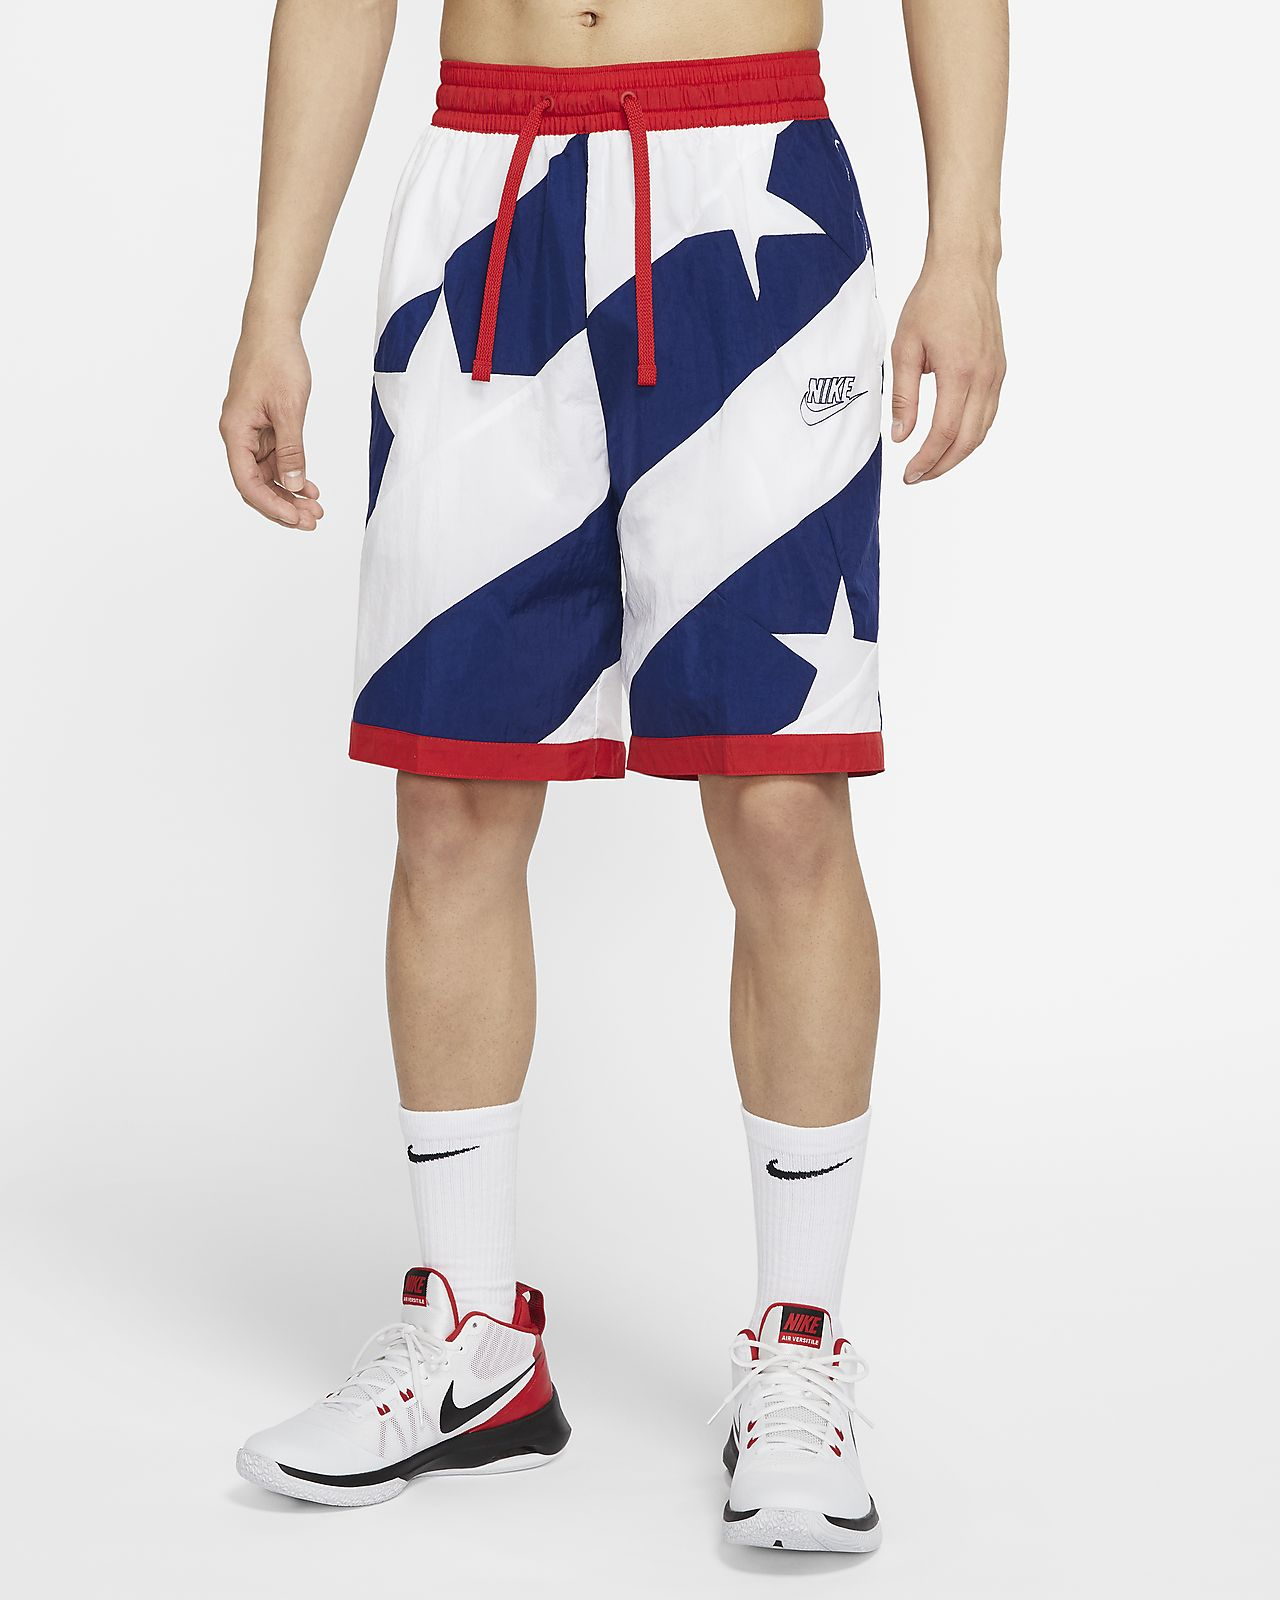 Nike Dri-FIT Throwback Pantalons curts de bàsquet - Home